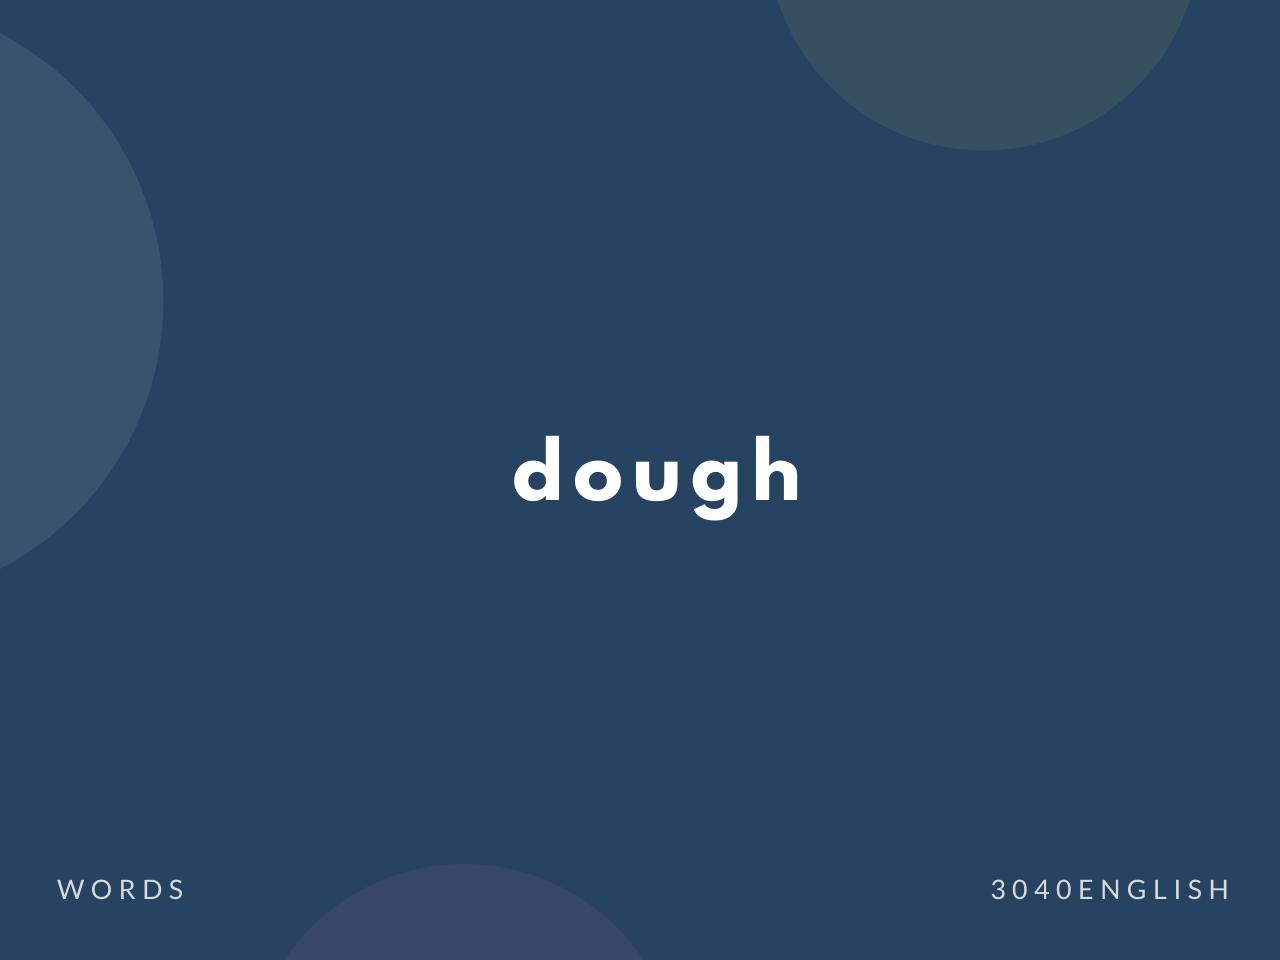 dough の意味と簡単な使い方【音読用例文あり】